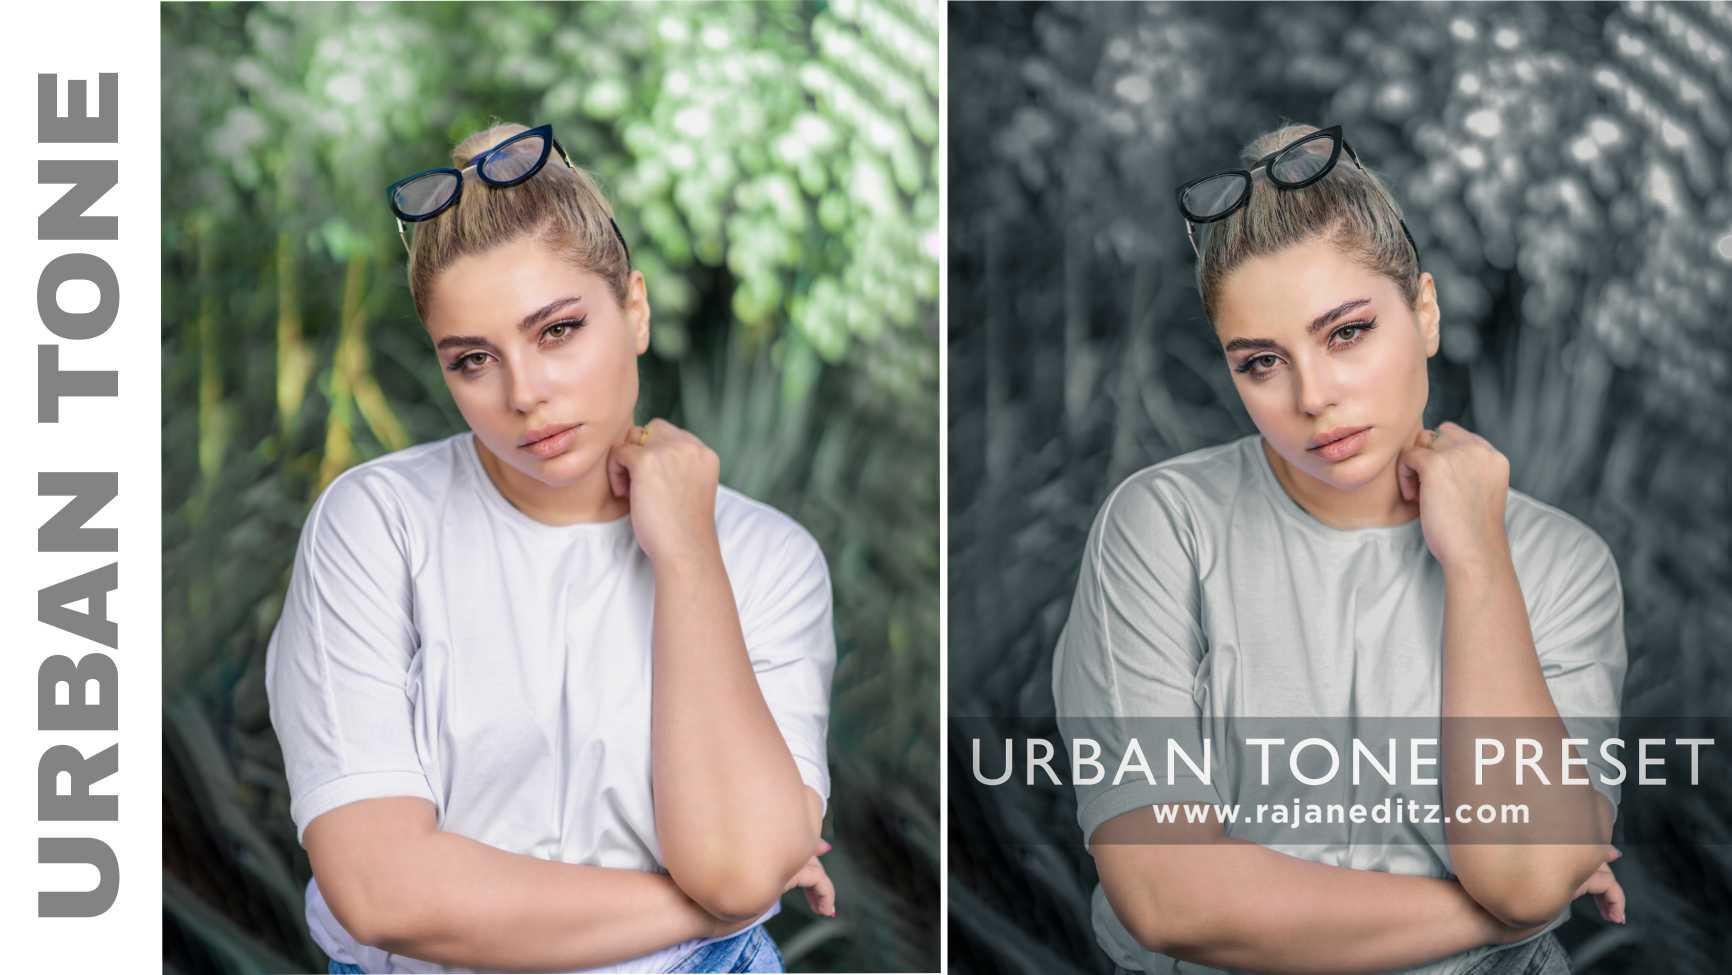 Urban tone preset thumbnail download free